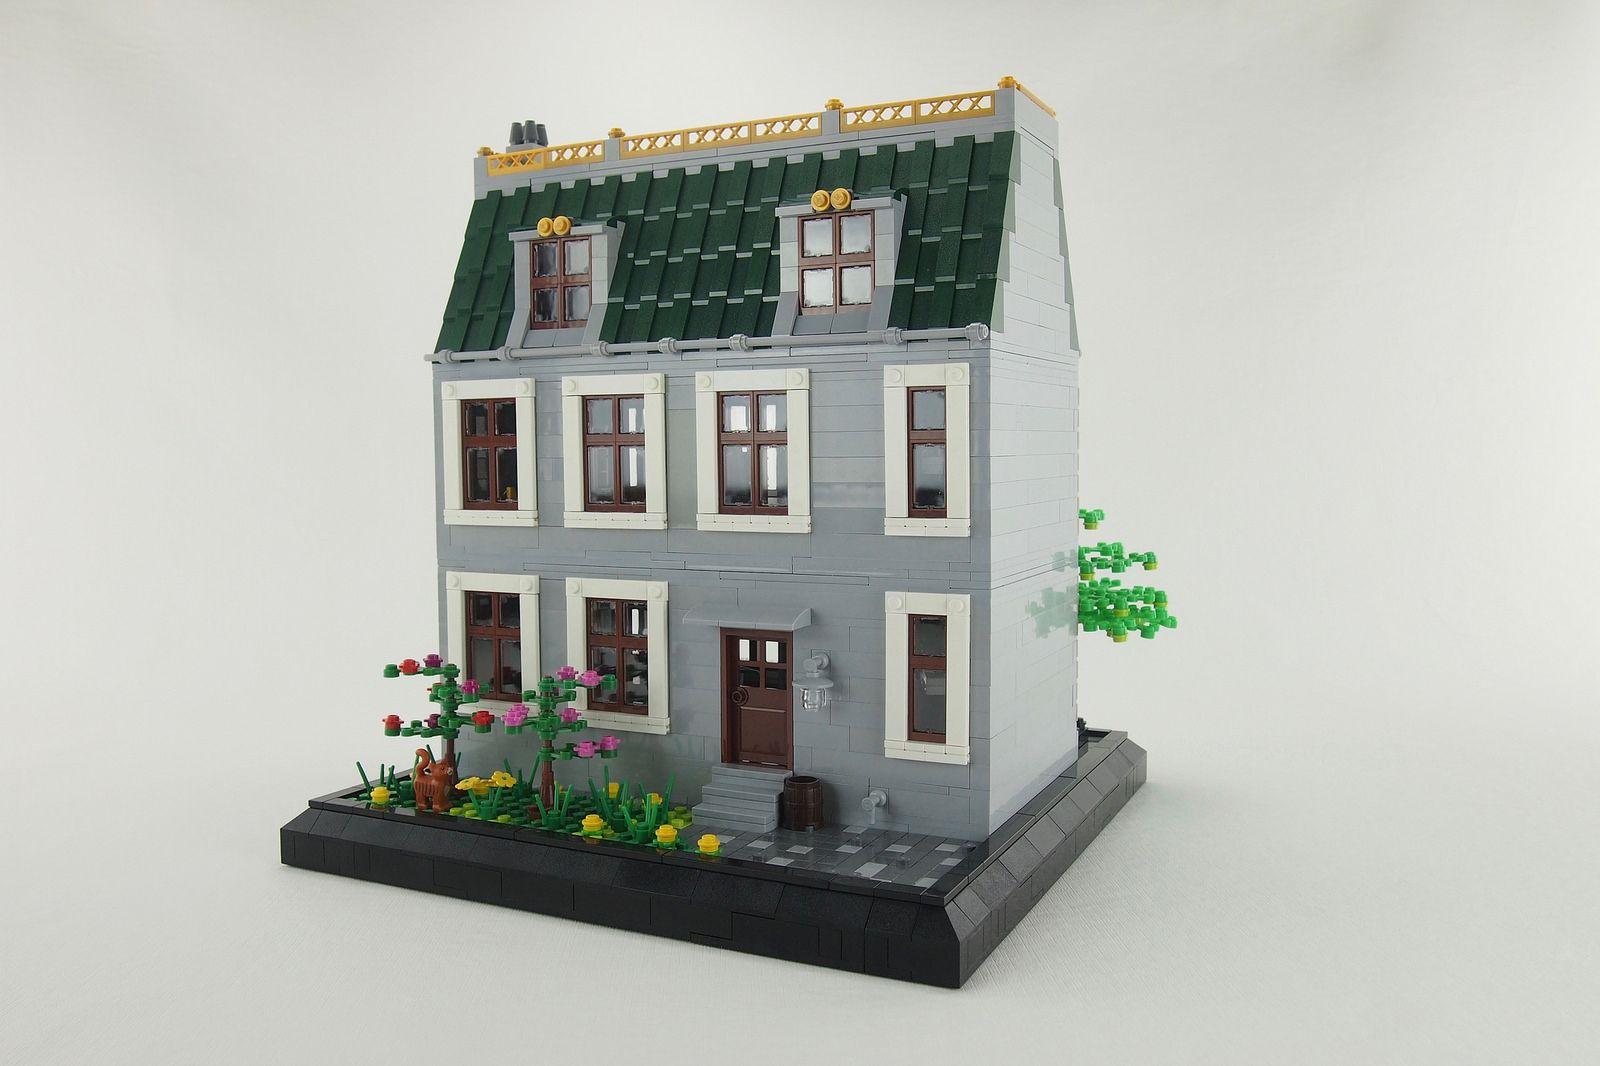 Bürobau Hinten | by FiliusRucilo